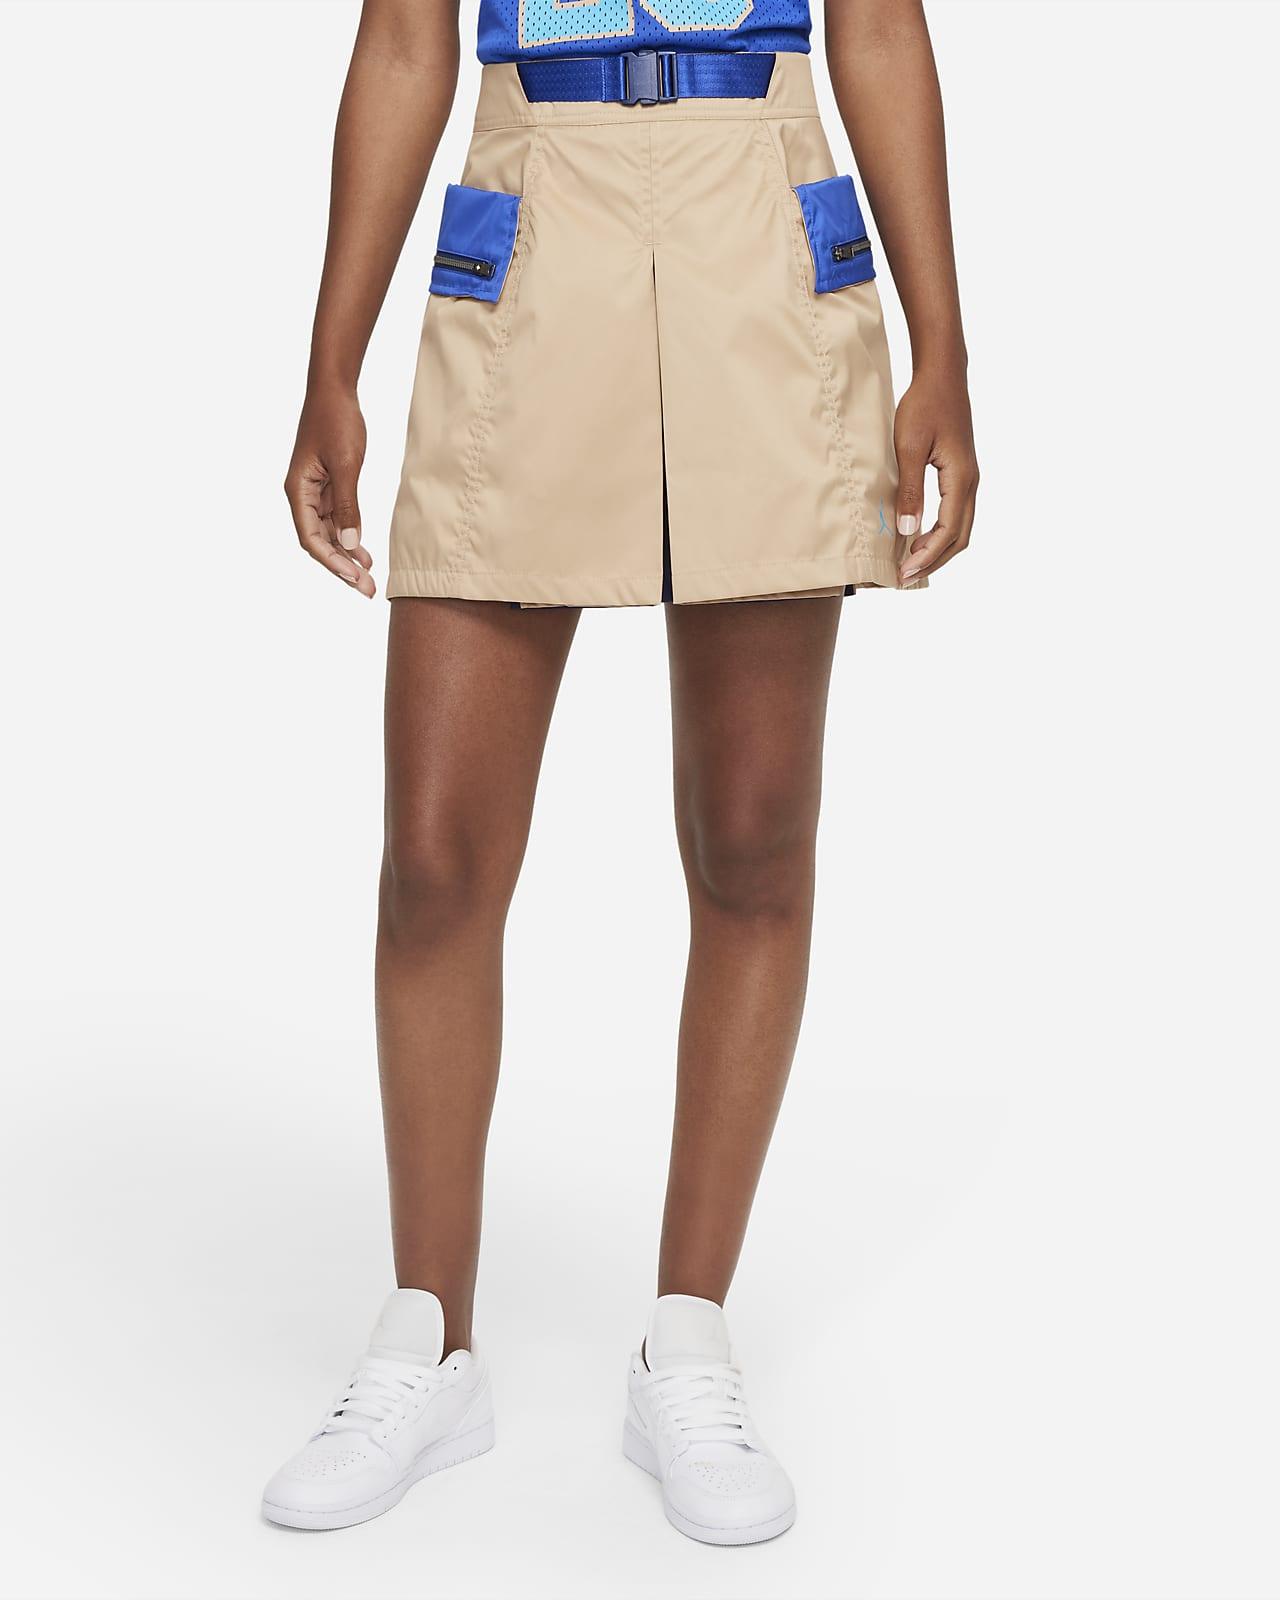 Jordan Next Utility Capsule Women's Skirt